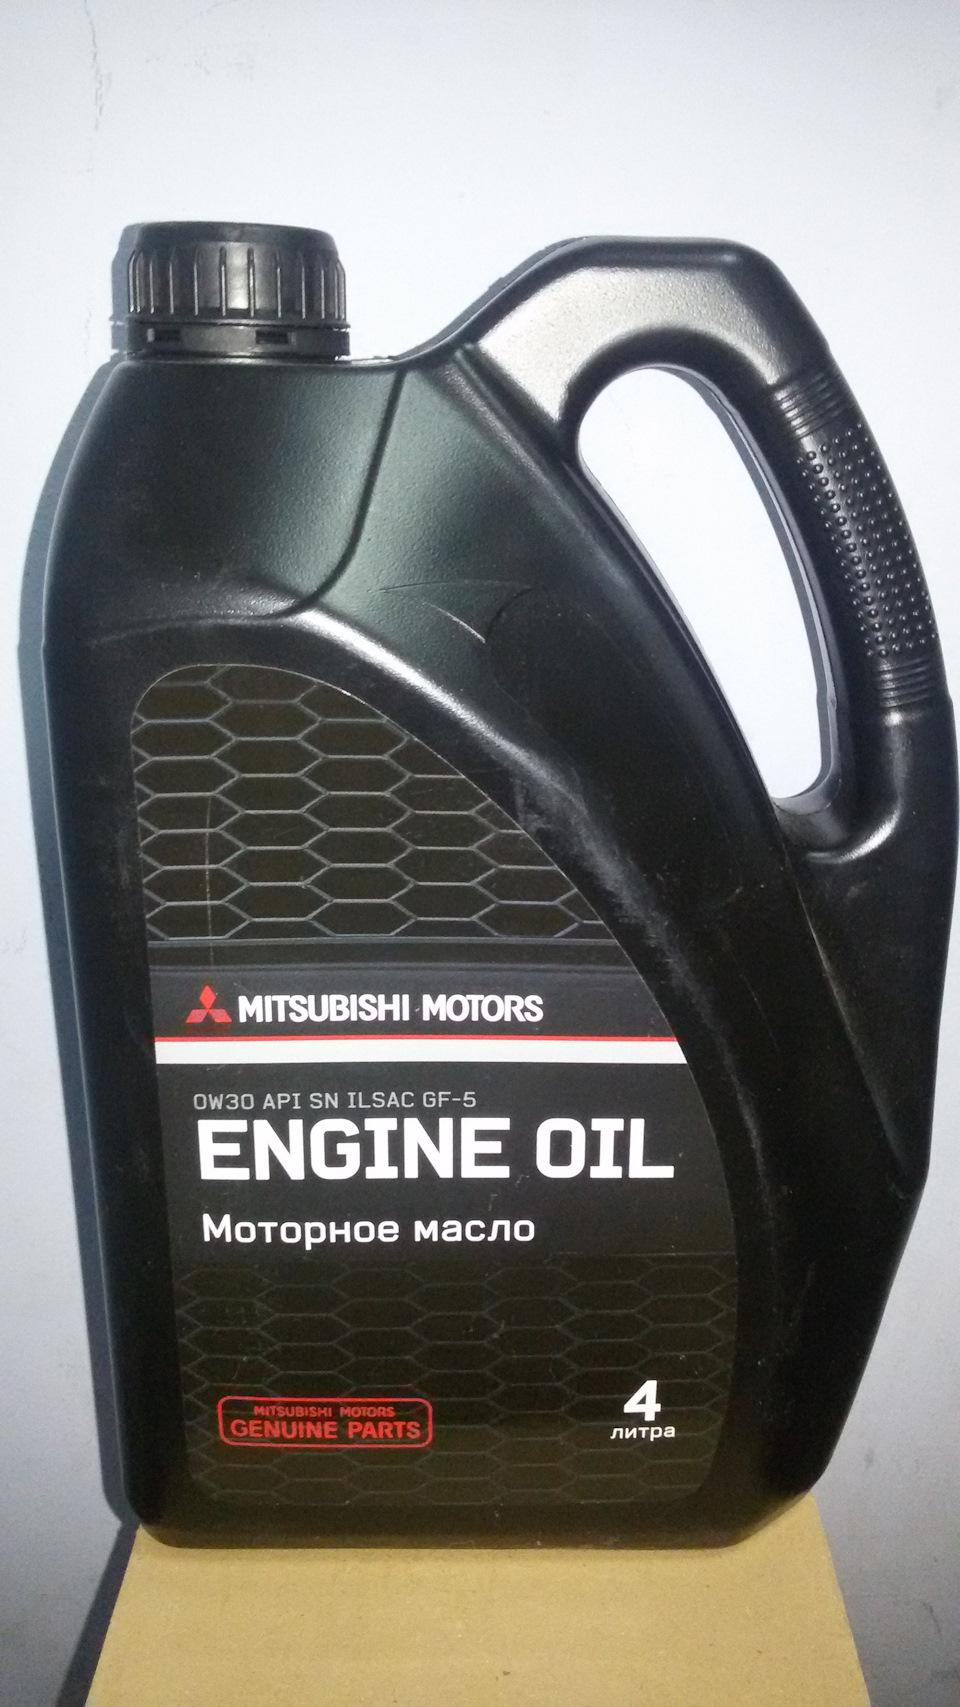 Mitsubishi Engine Oil Api Sn 0w 30